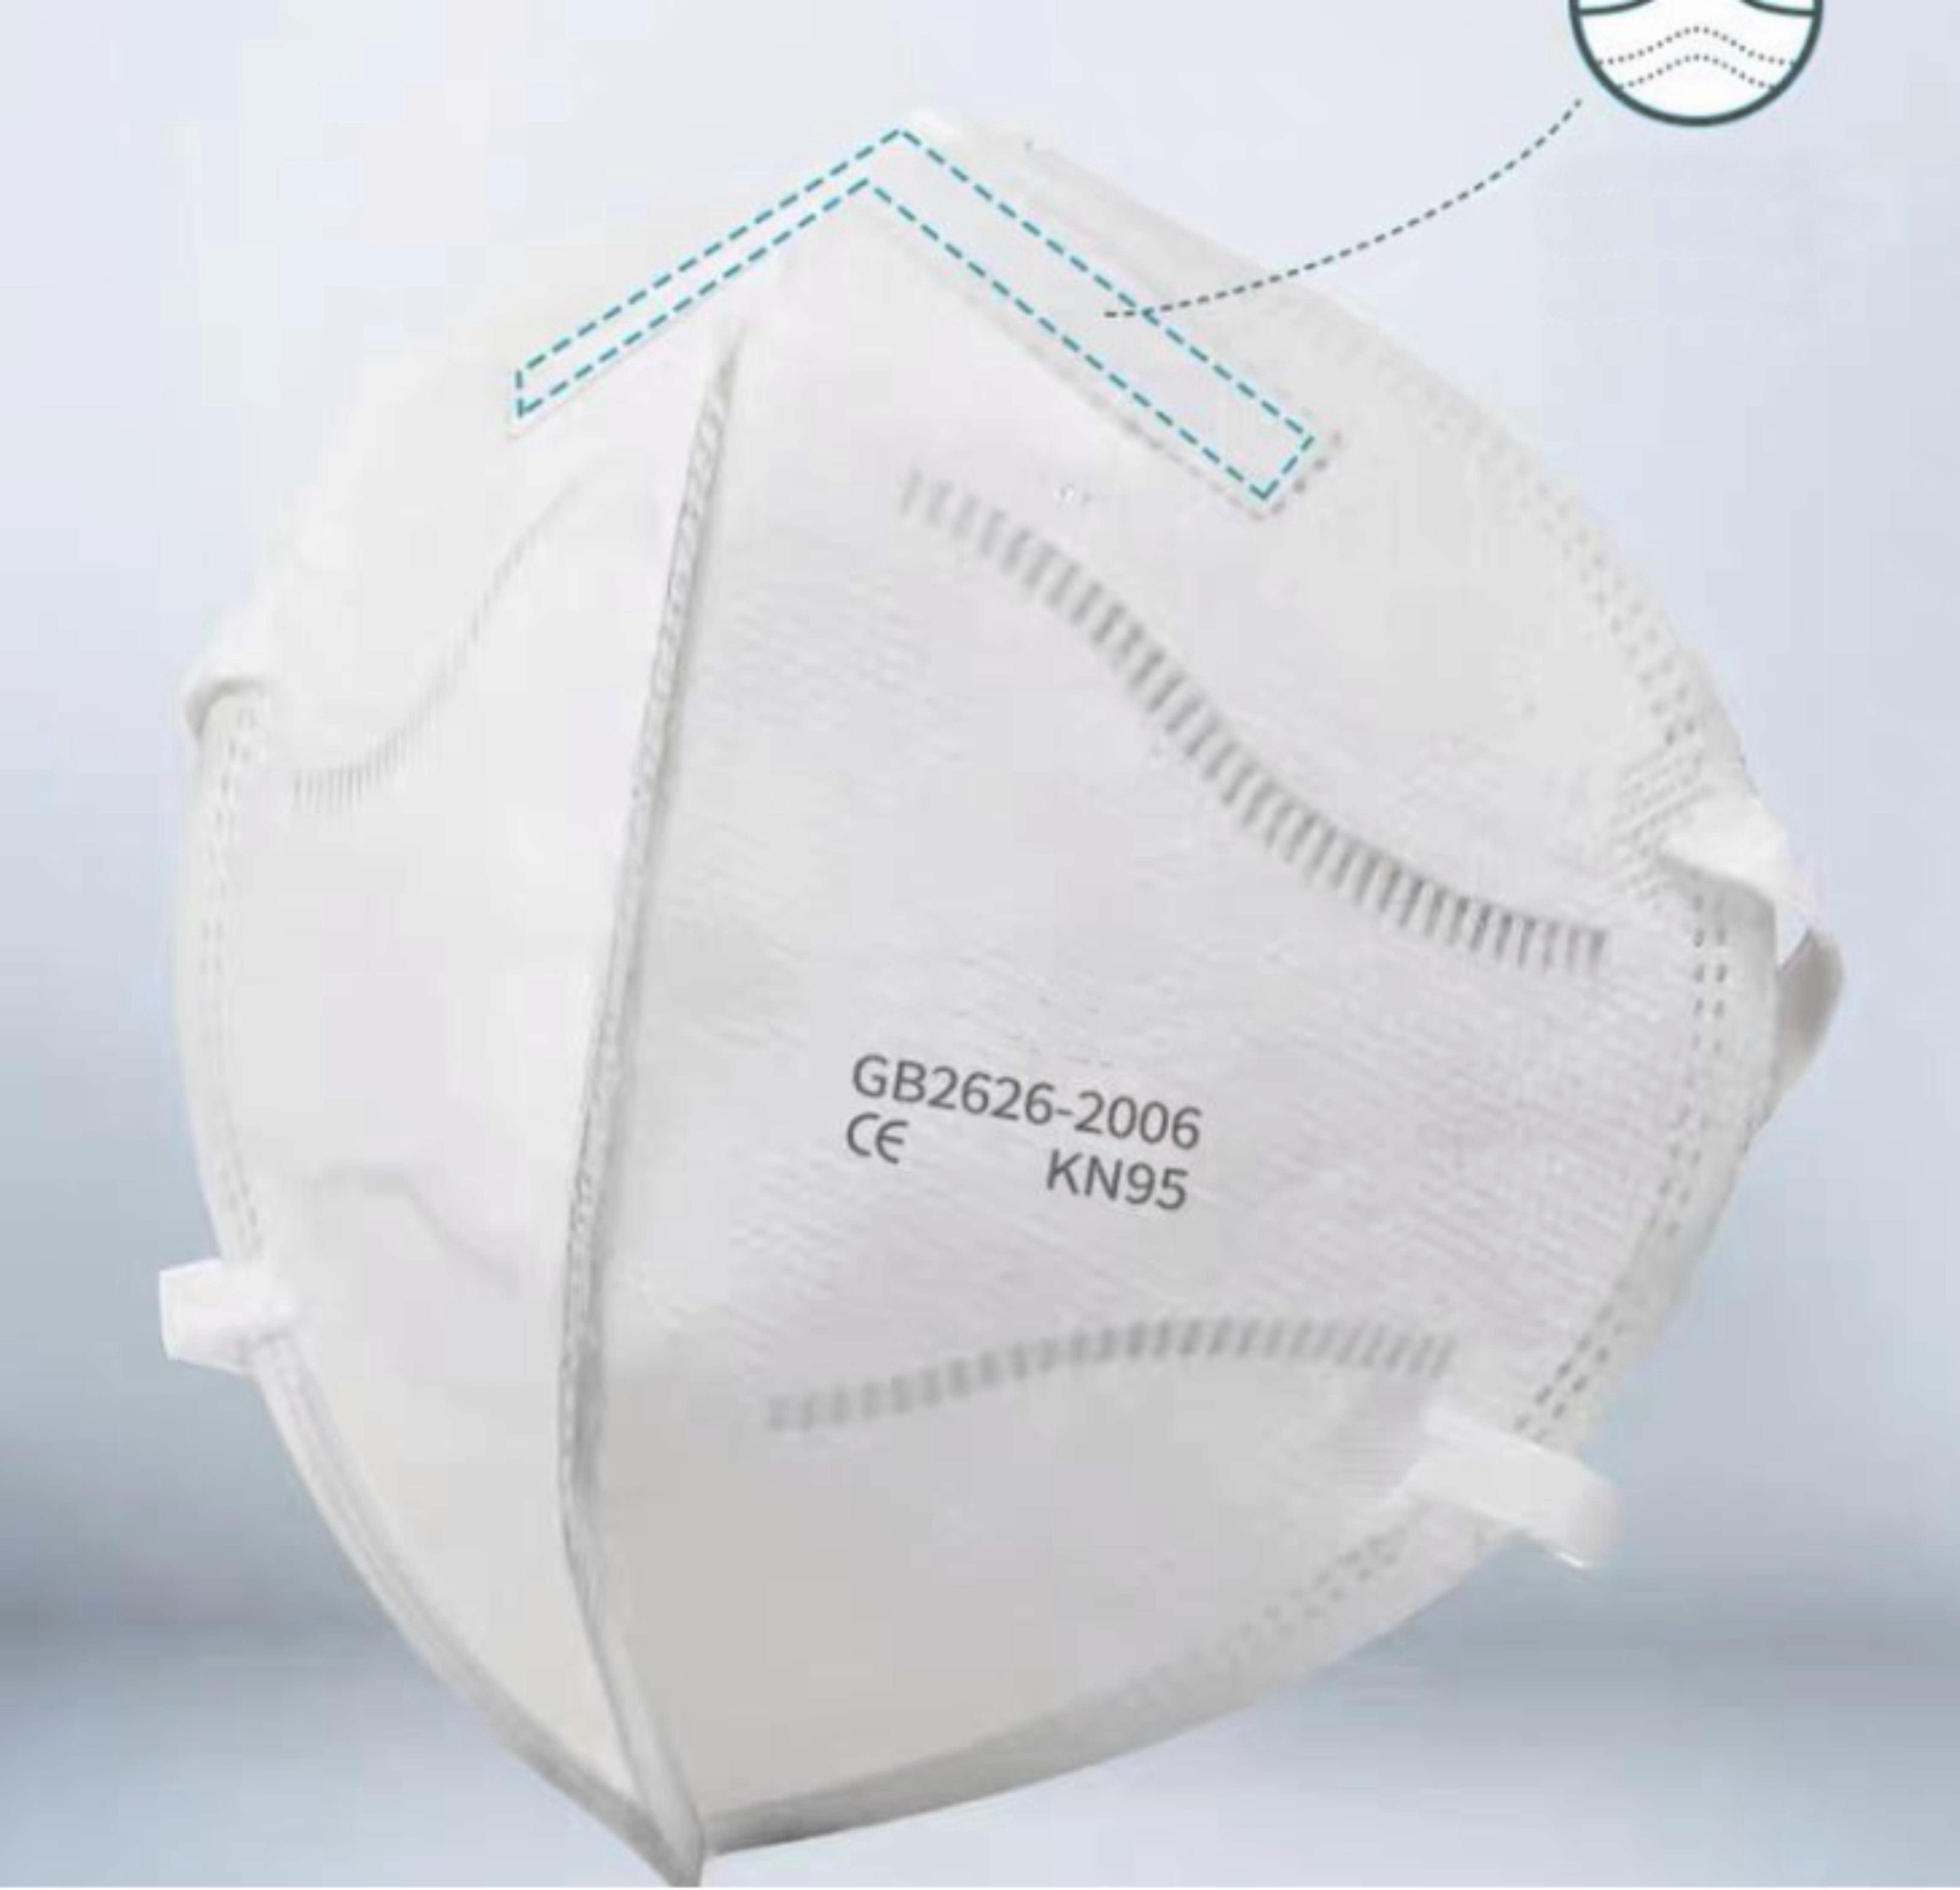 FFP2 respirator KN95